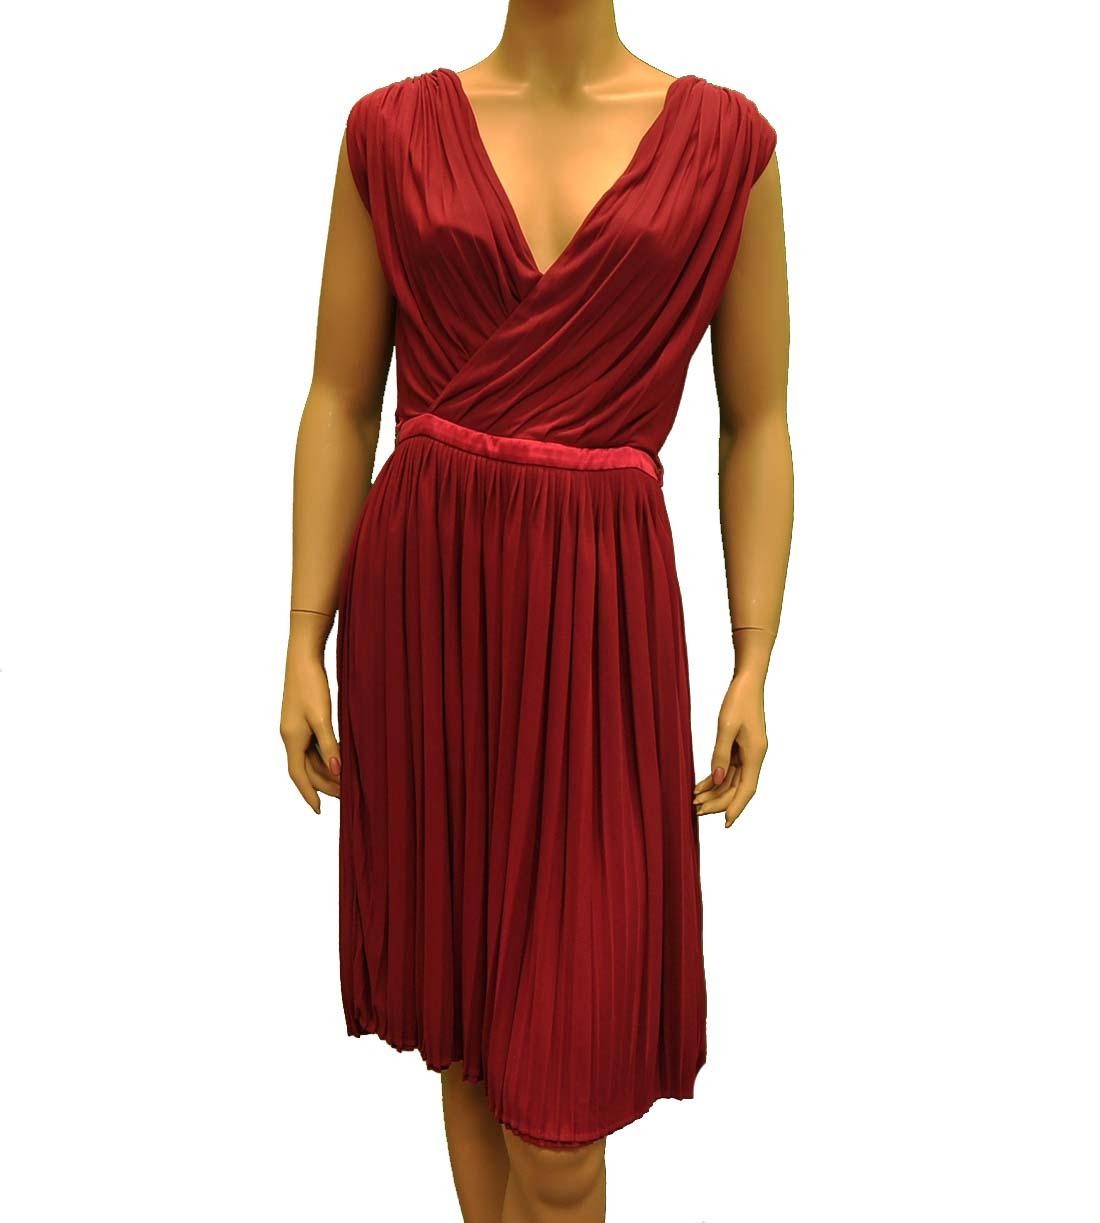 Gucci Red / Purple Acetate Knee Length Dress